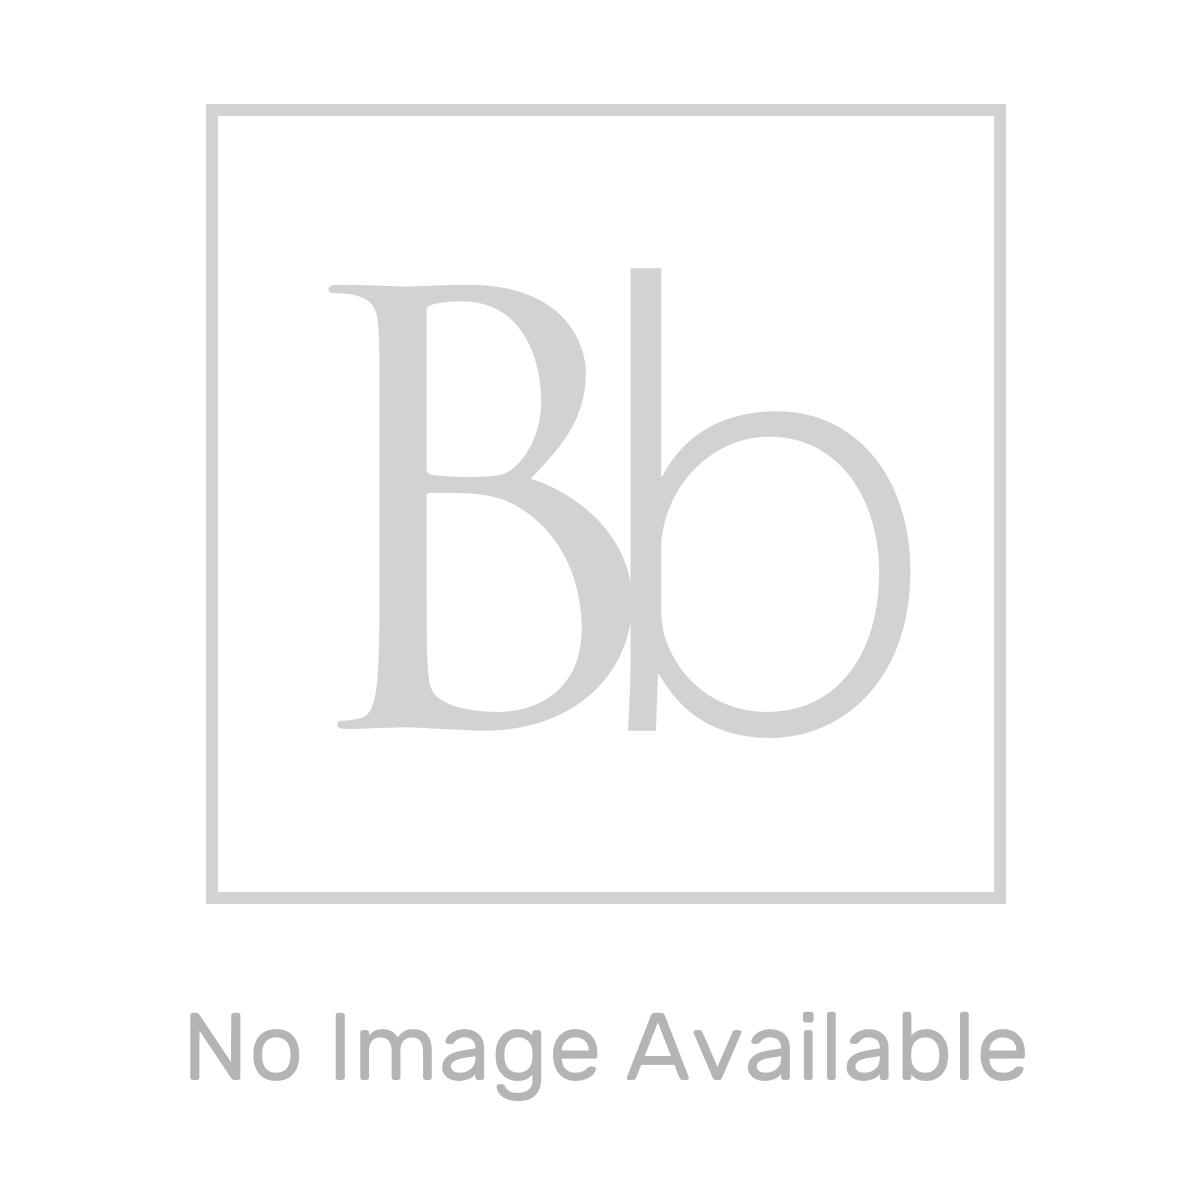 RAK Precious Travertino Ivory Wall Hung Counter Basin 800mm with Brackets Measurements